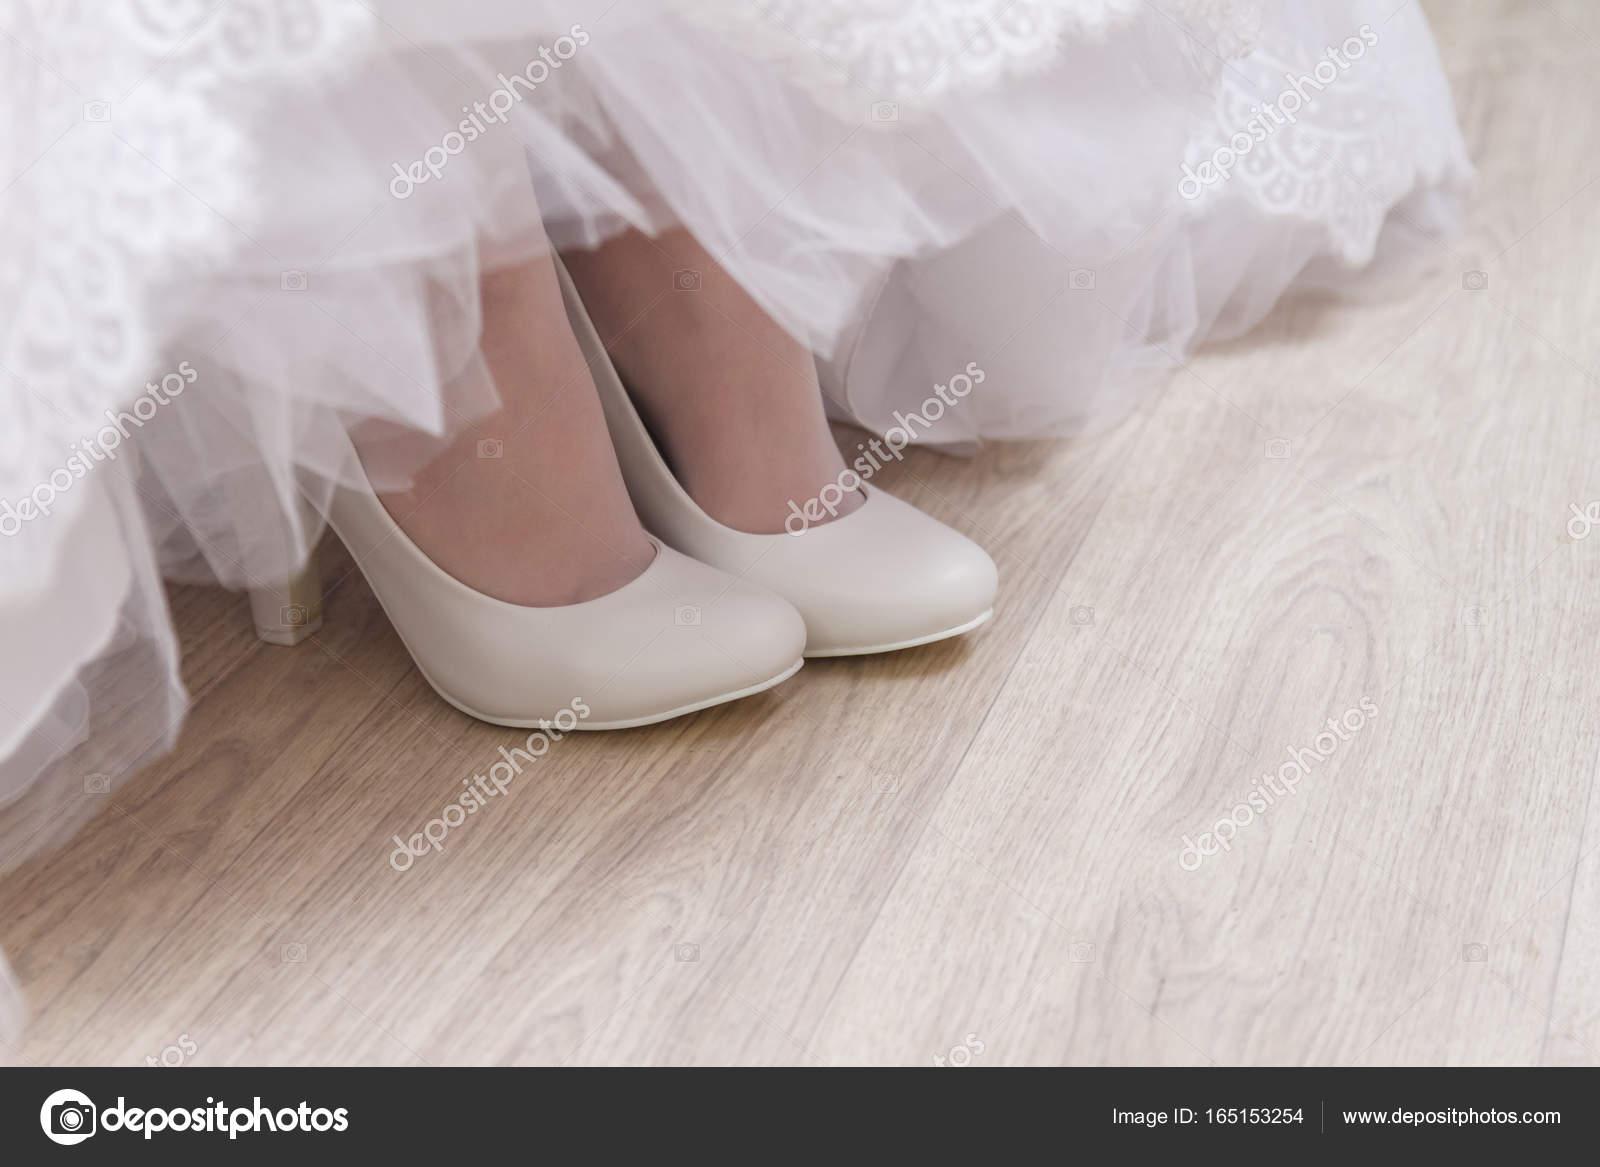 8c87197335cc Παπούτσια λευκά όμορφη νύφη, πόδια της νύφης - νυφικό λεπτομέρειες — Εικόνα  από ...